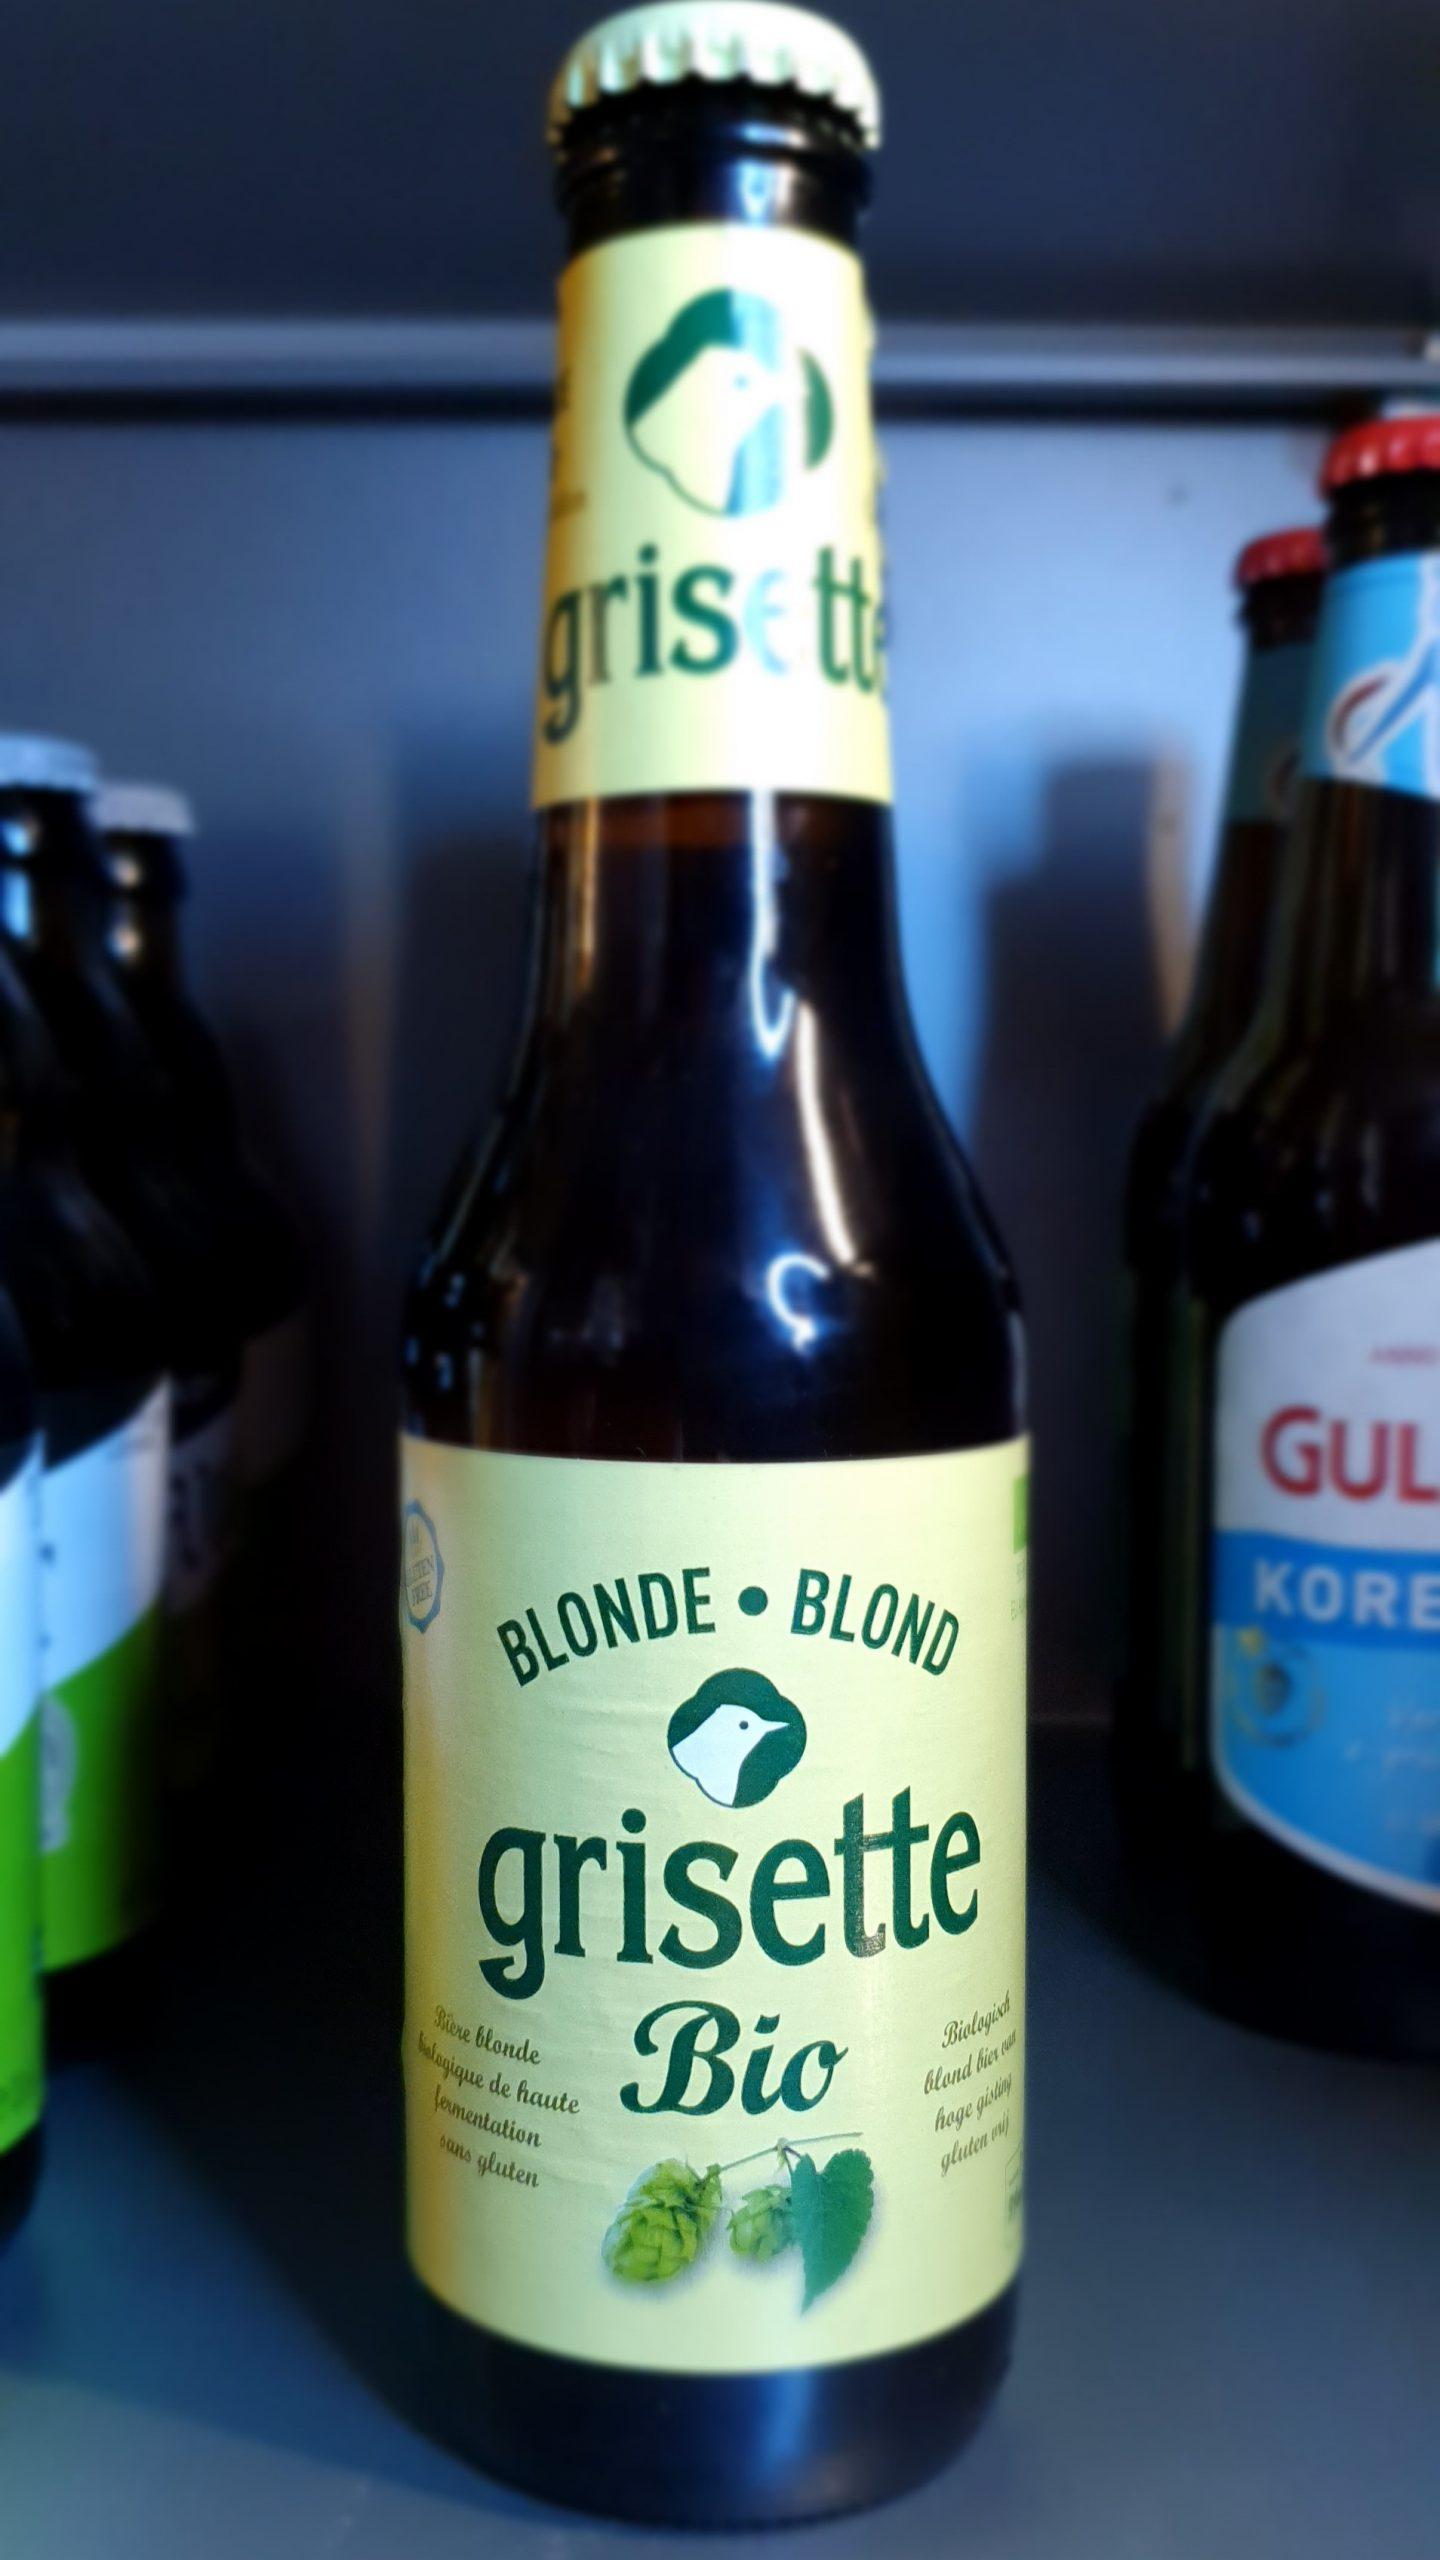 Grisette blond -Glutenvrij- van brouwerij St. Feullien